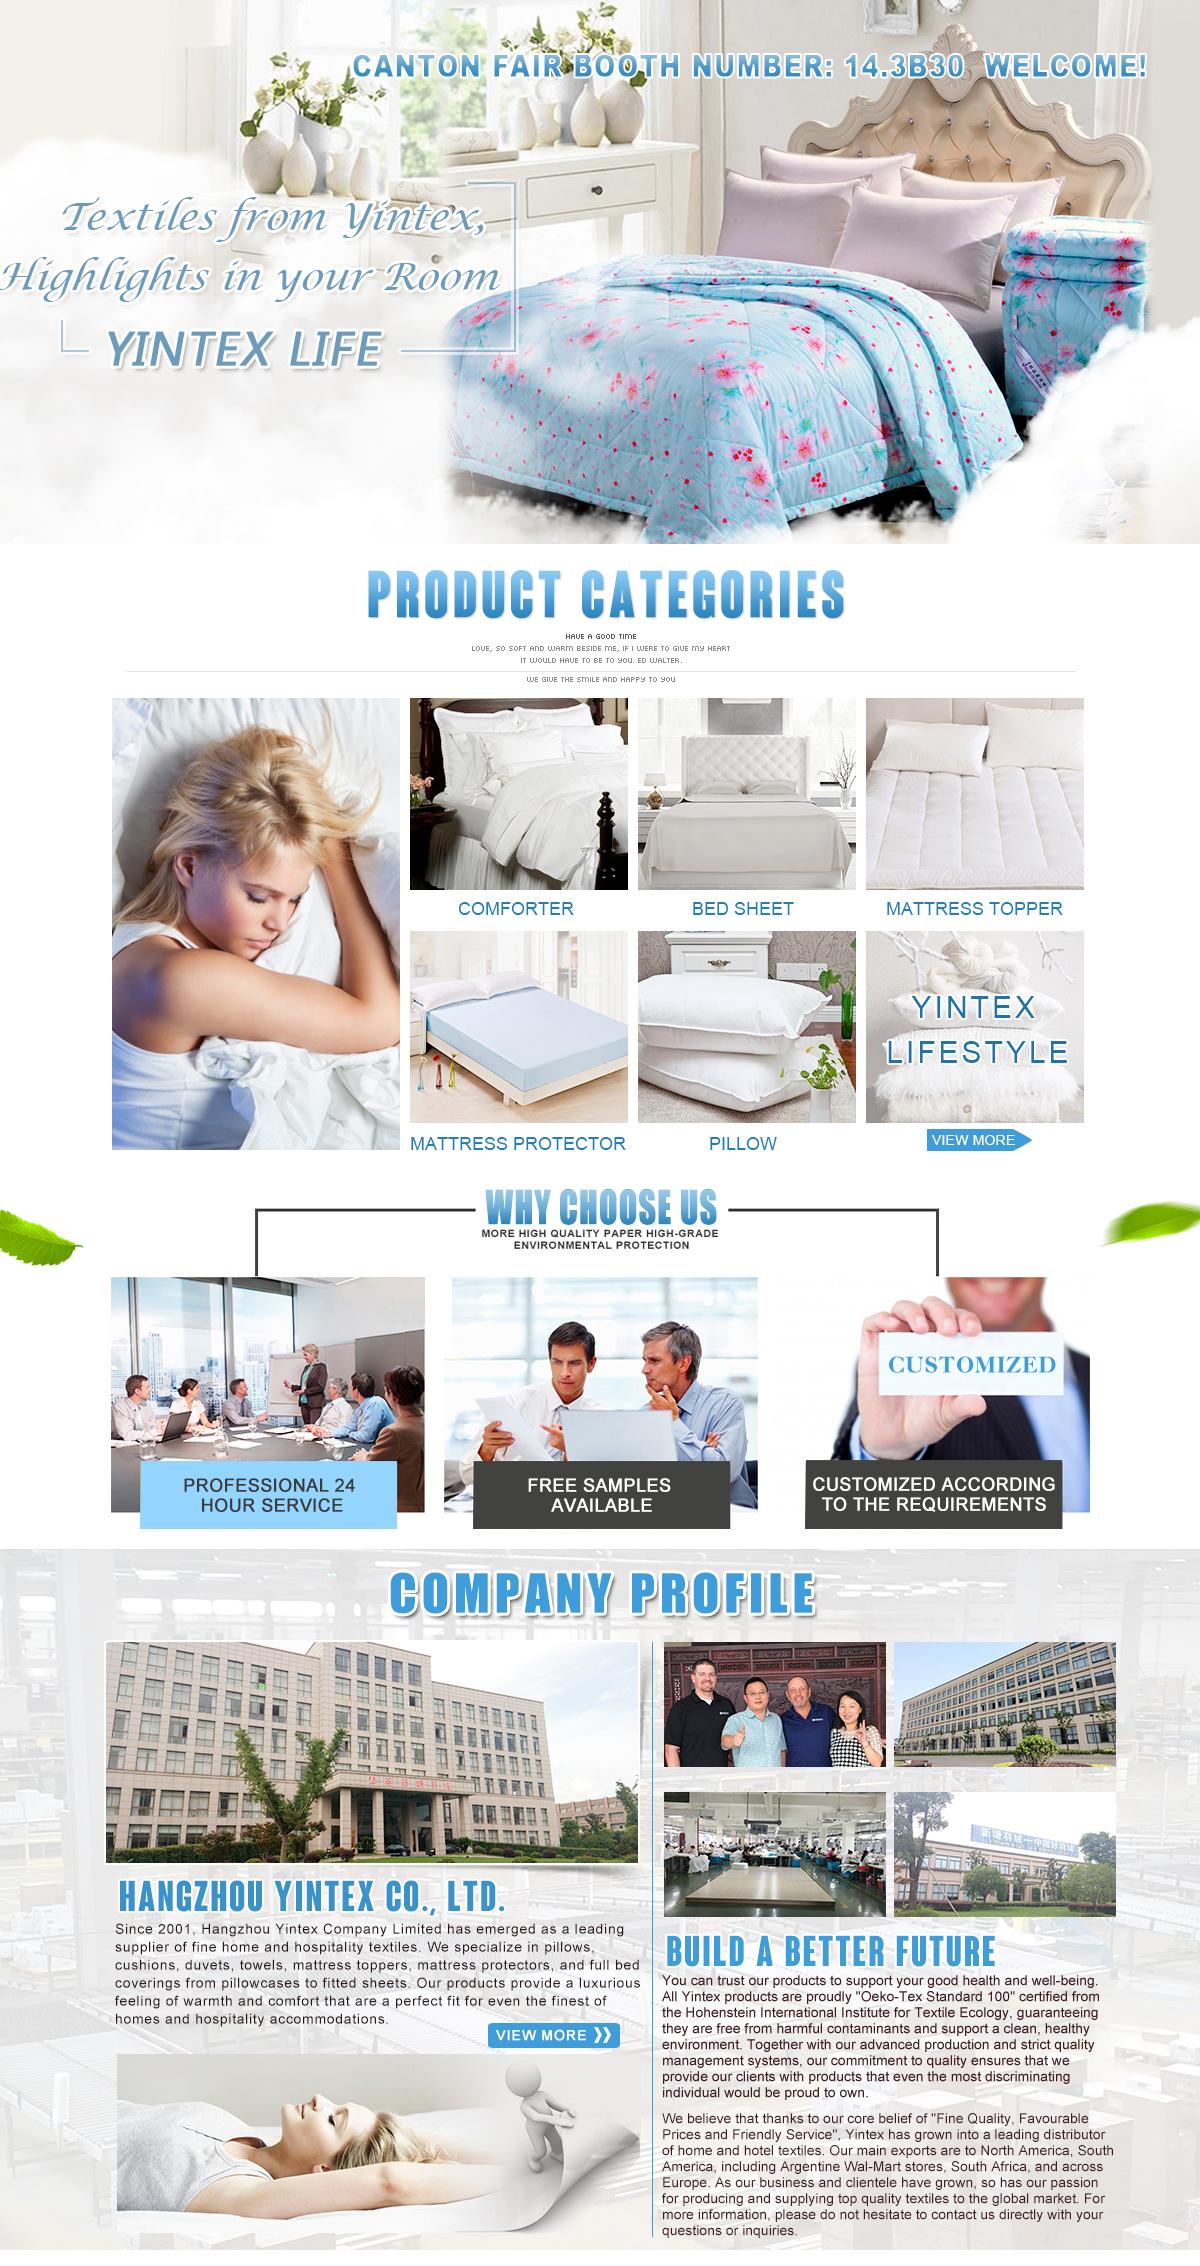 Le Vie Del Cotone Copripiumino.Hangzhou Yintex Co Ltd Duvet Pillow